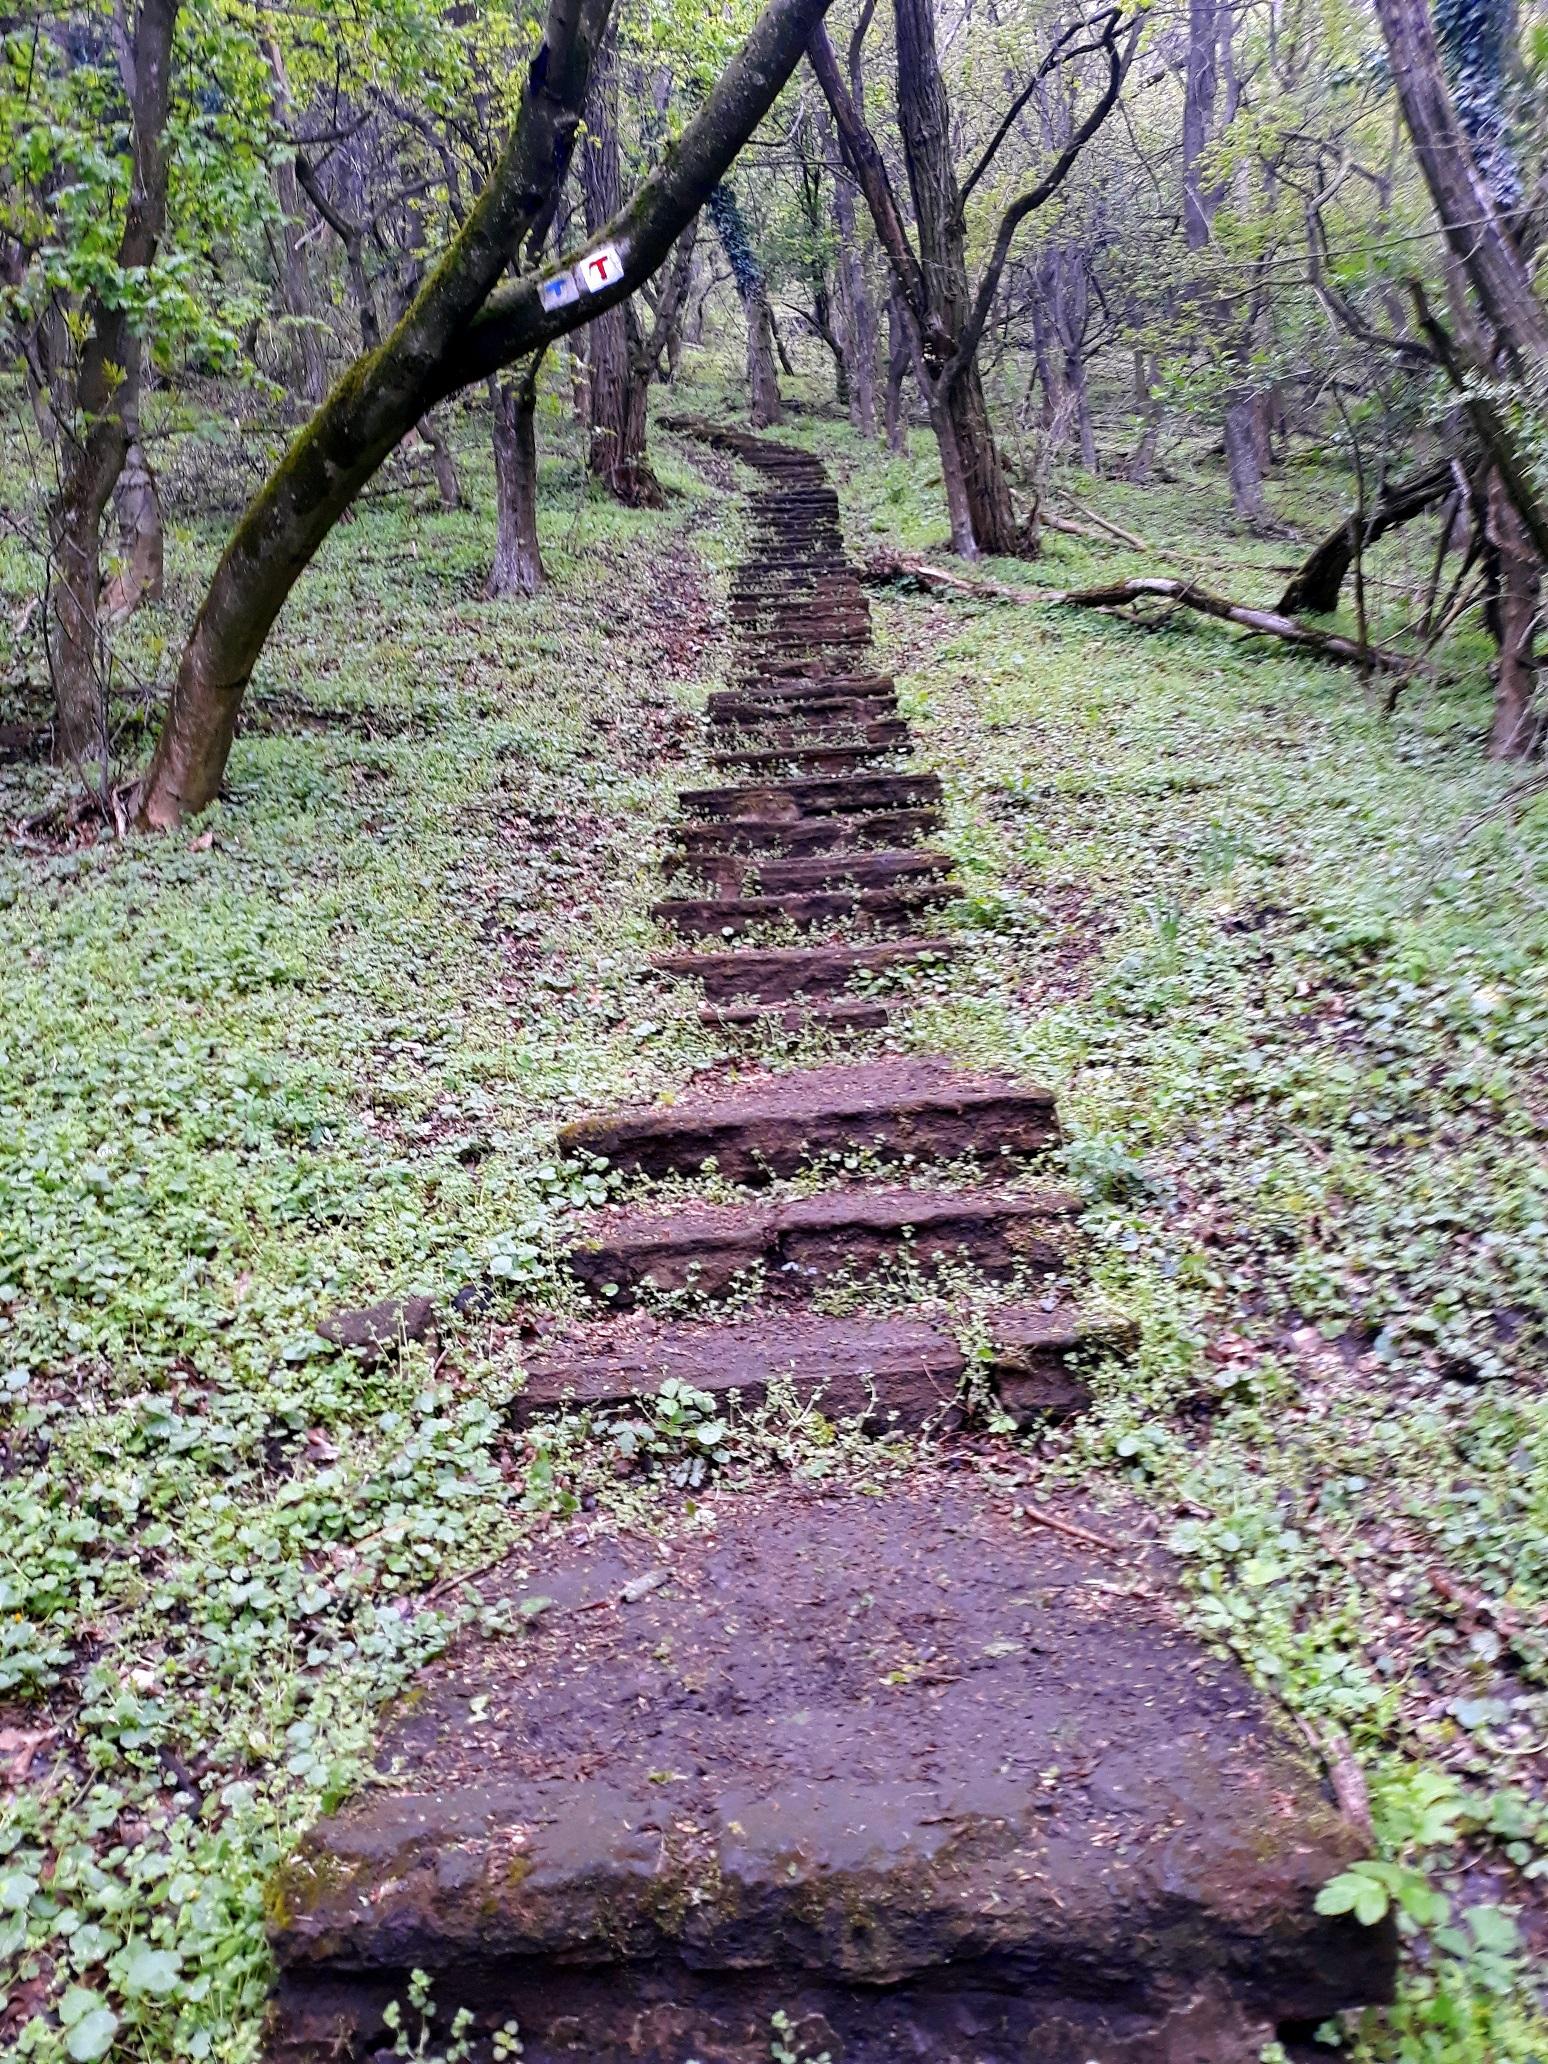 277 lépcsőfok